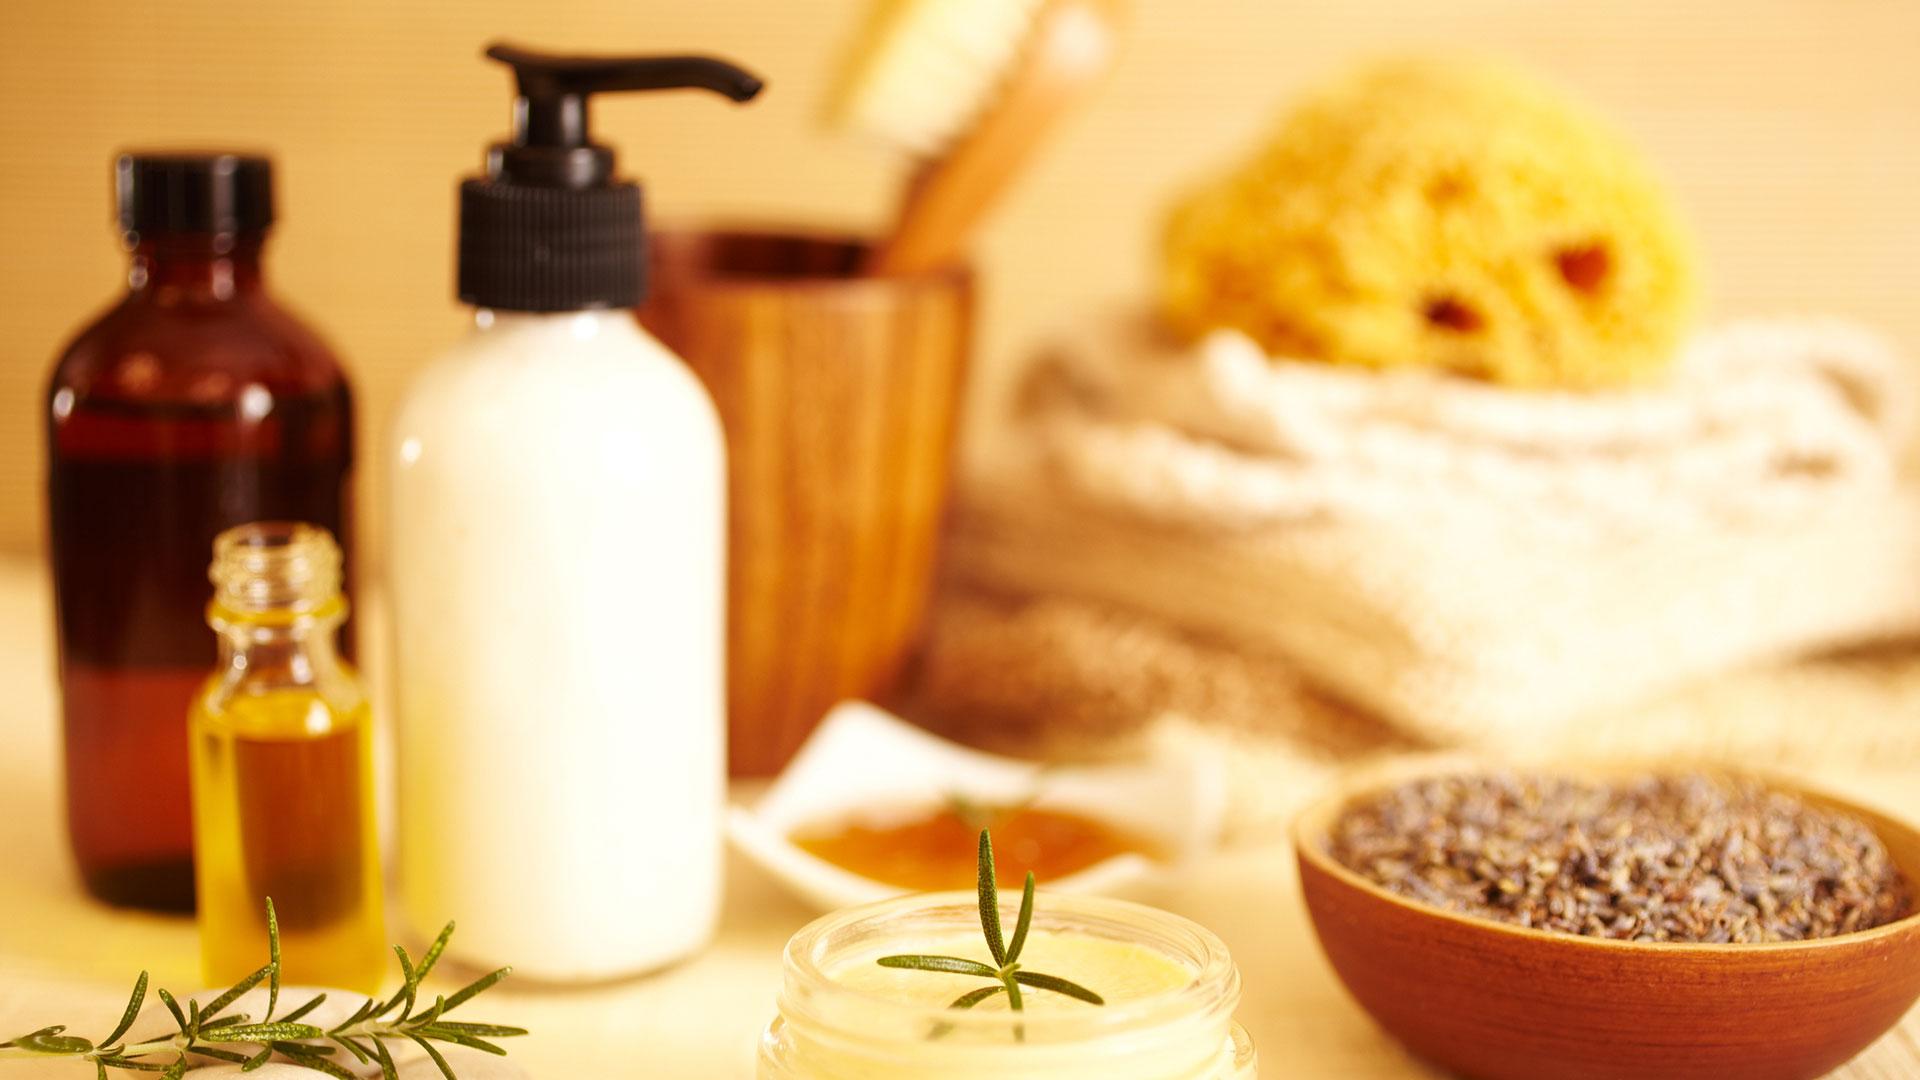 Get Healthy, Glowing Skin: An Ayurvedic Skincare Routine